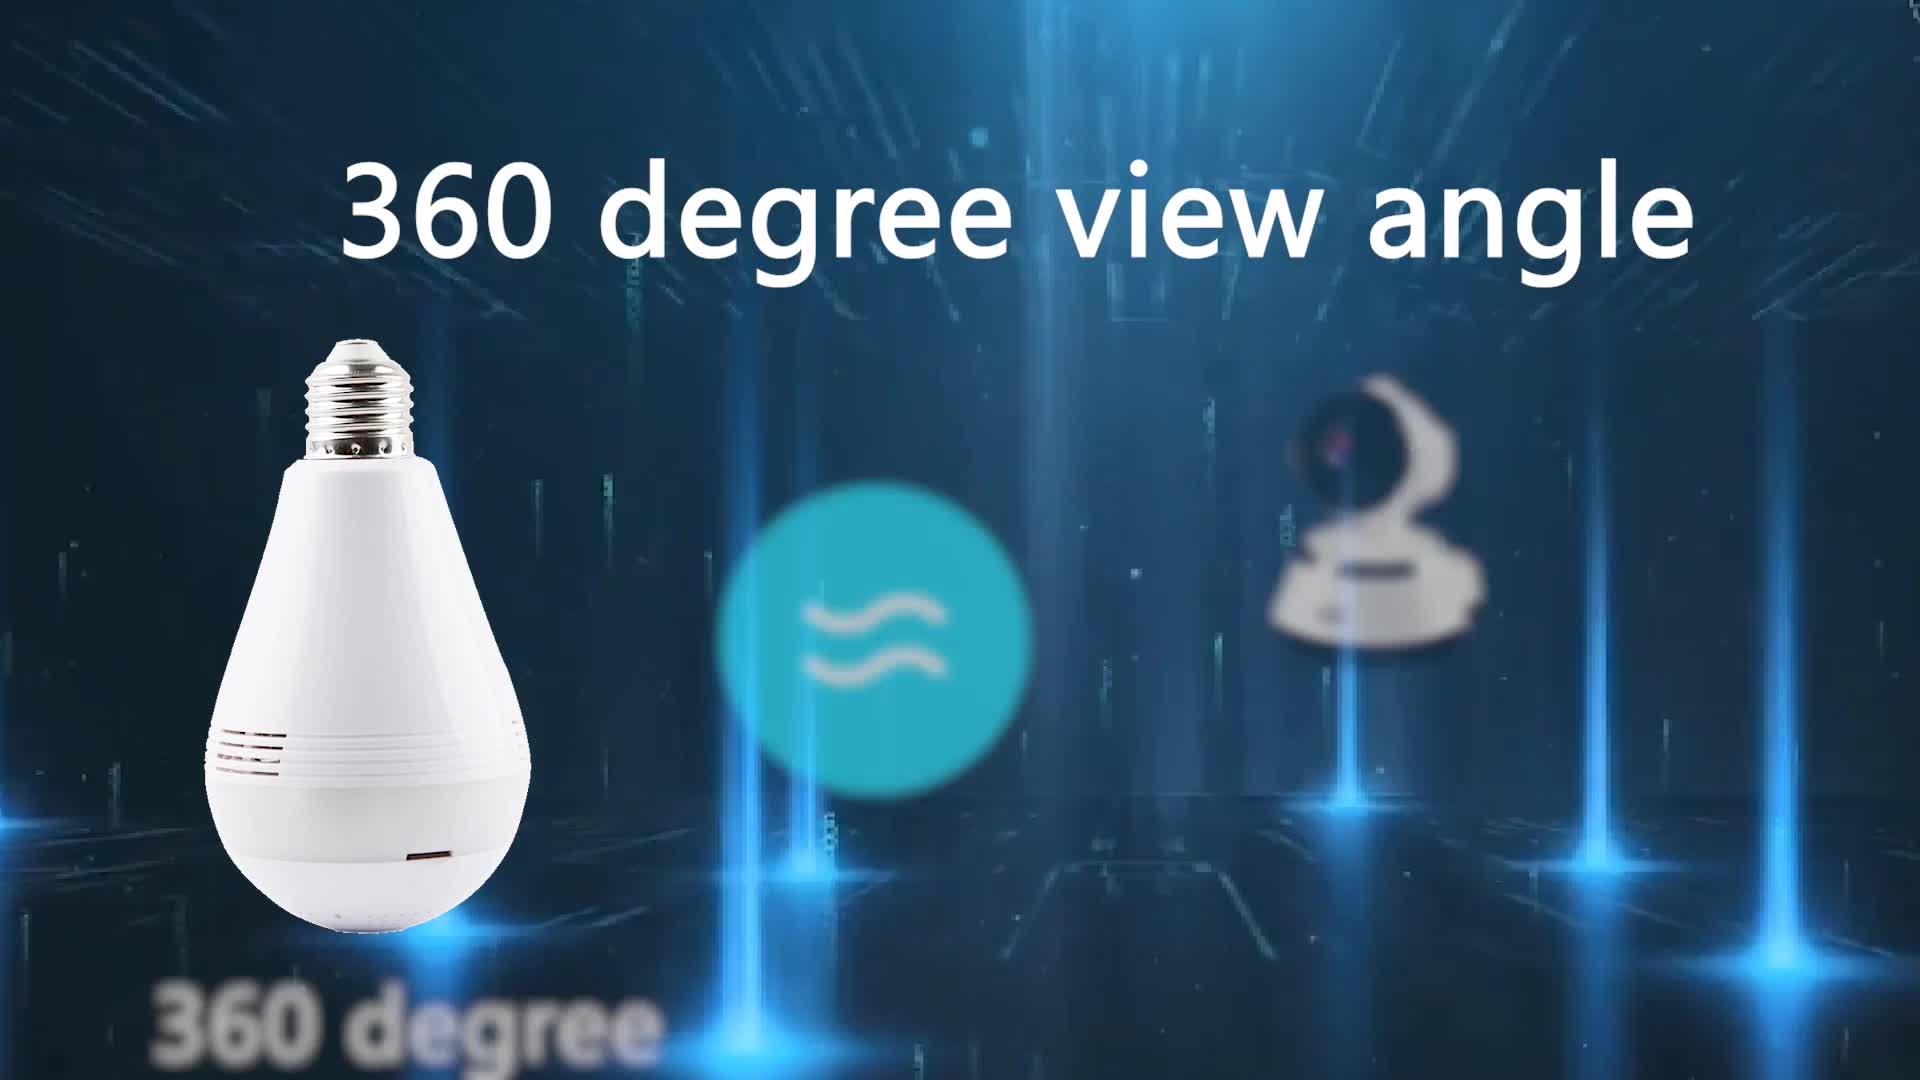 Kablosuz 1080 P WIFI Ev HD Video 360 Panoramik Casus Lamba ampul gizli kamera